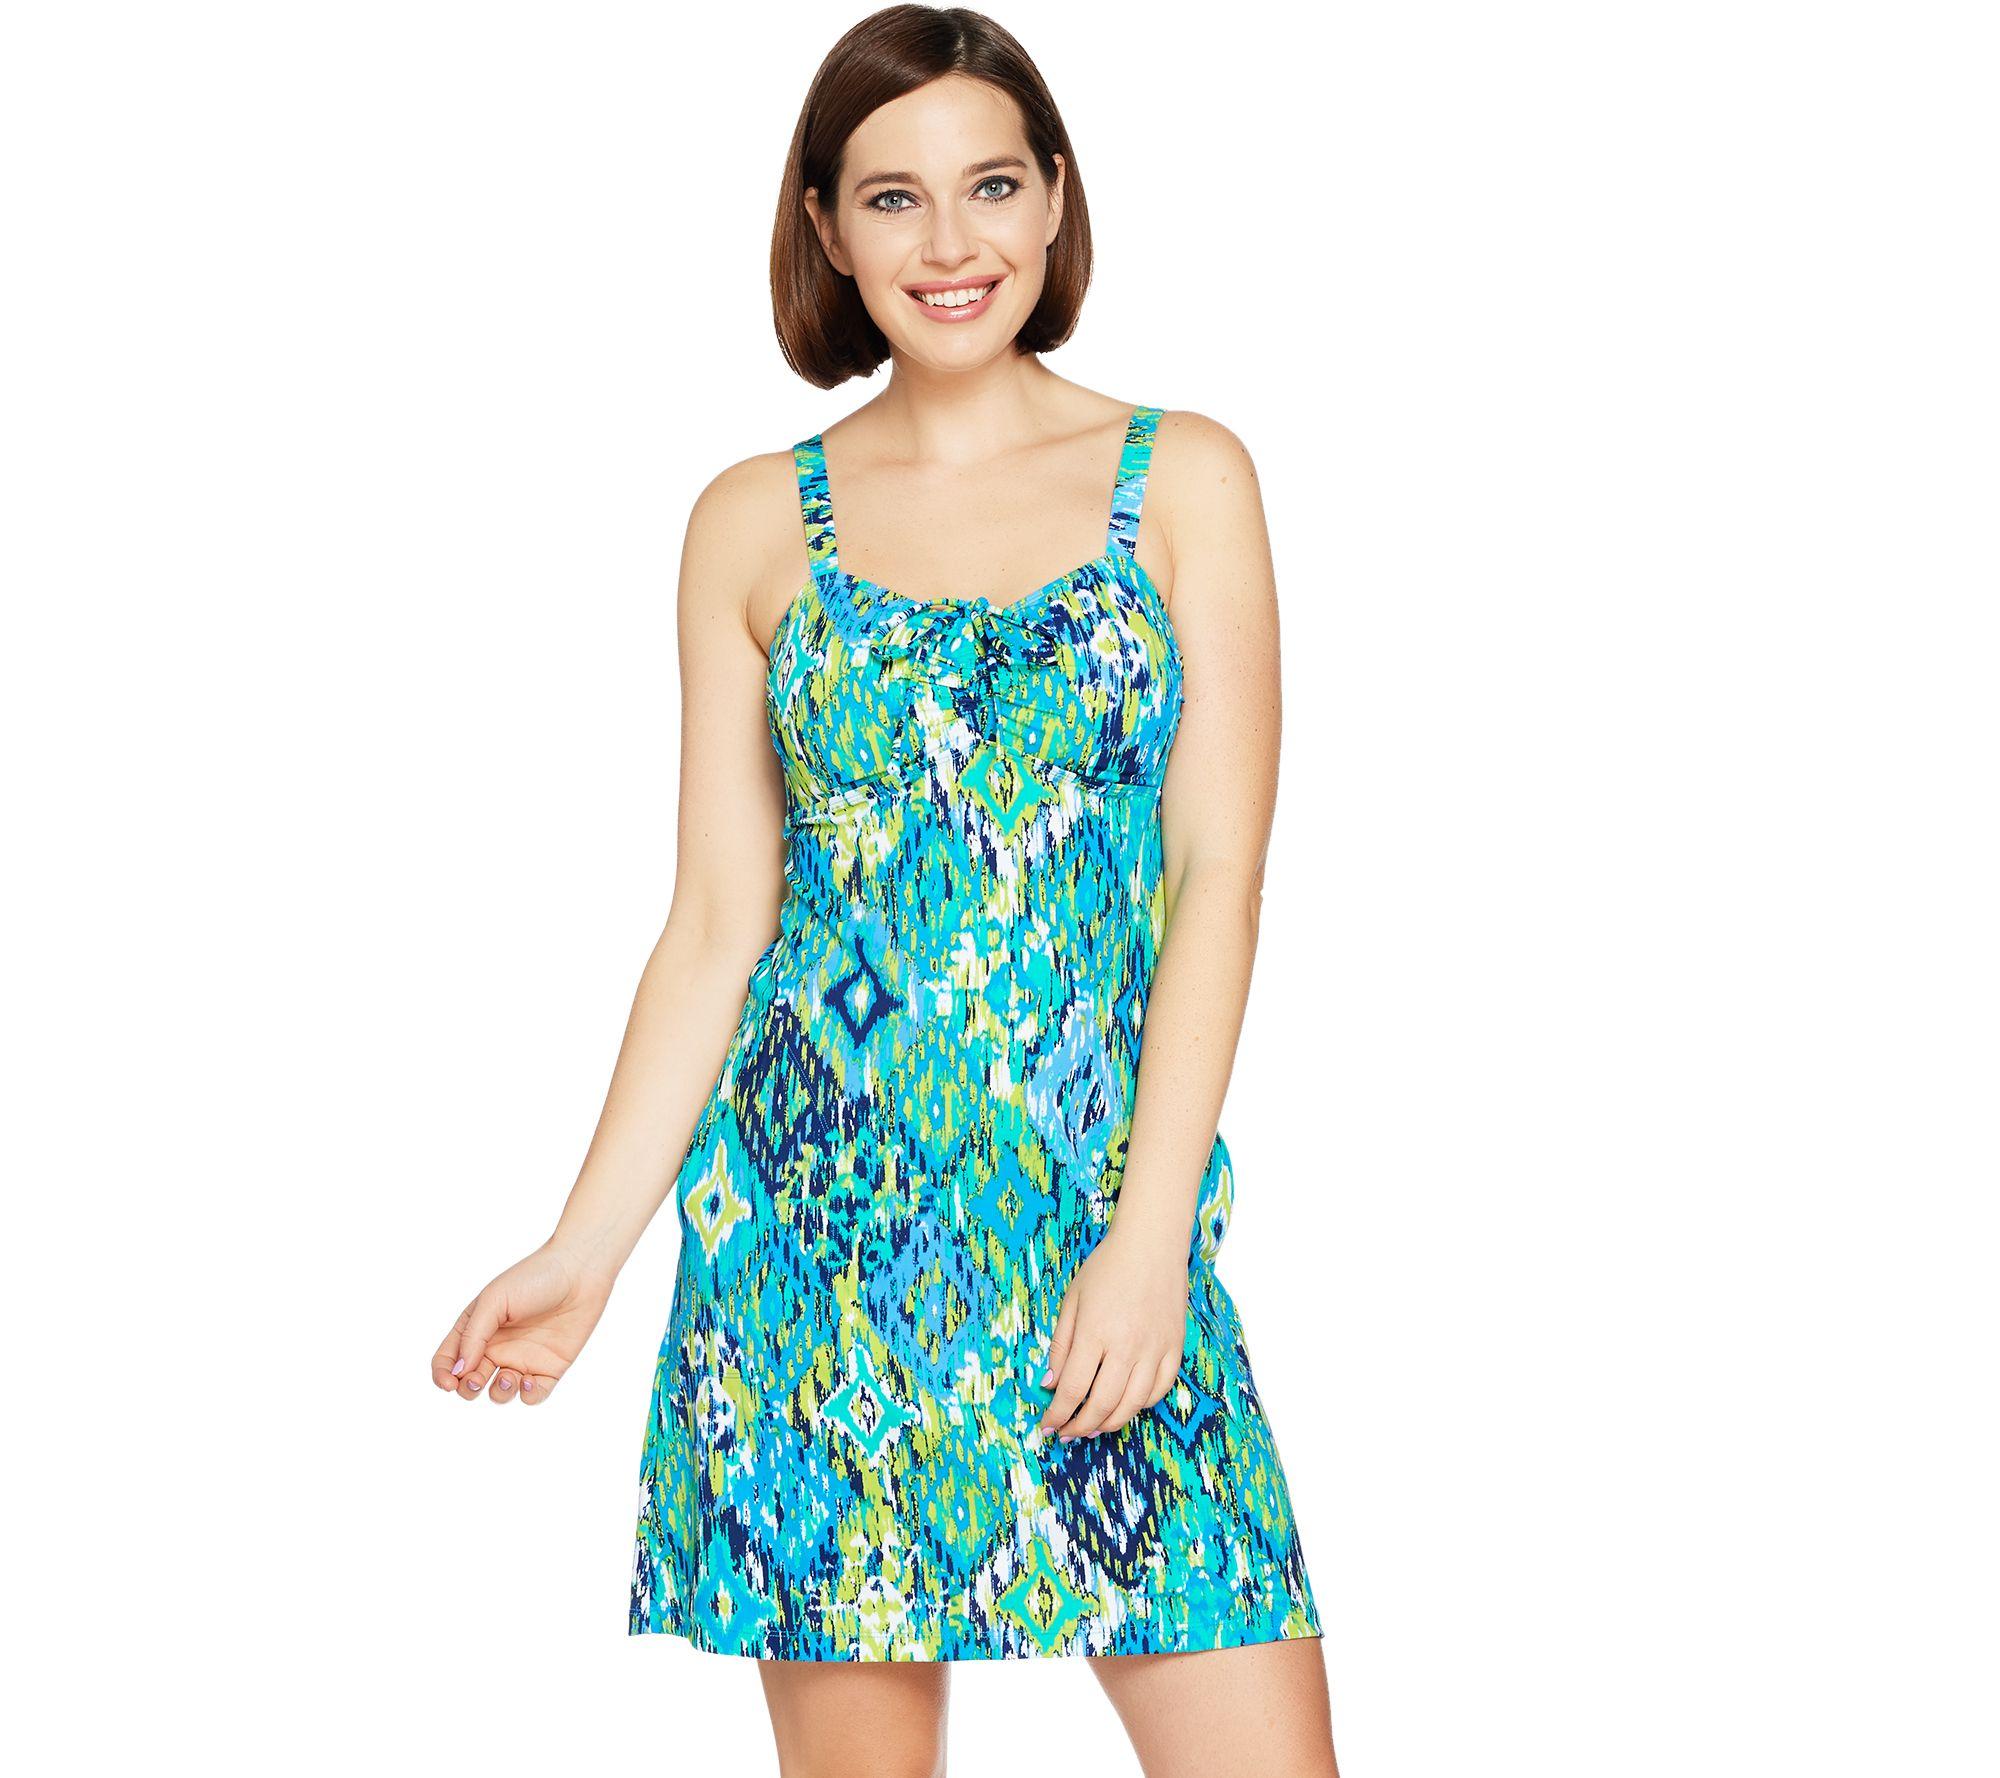 cd037f62a402e Denim   Co. Beach Drawstring Ruched Swim Dress - Page 1 — QVC.com